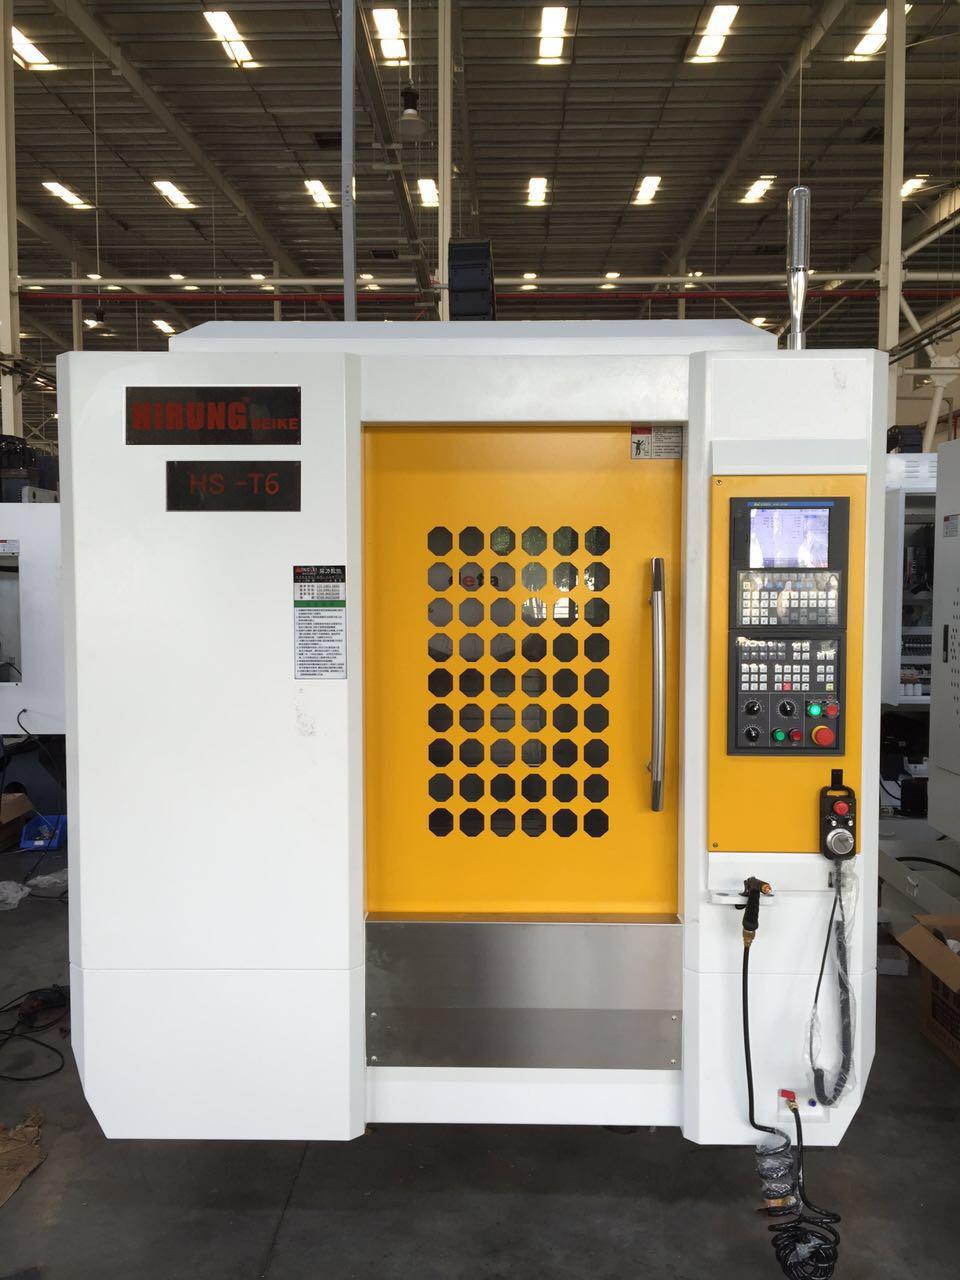 CNC Drill and Tap Machine/Metal Vertical Drilling Machine (HS-T6)